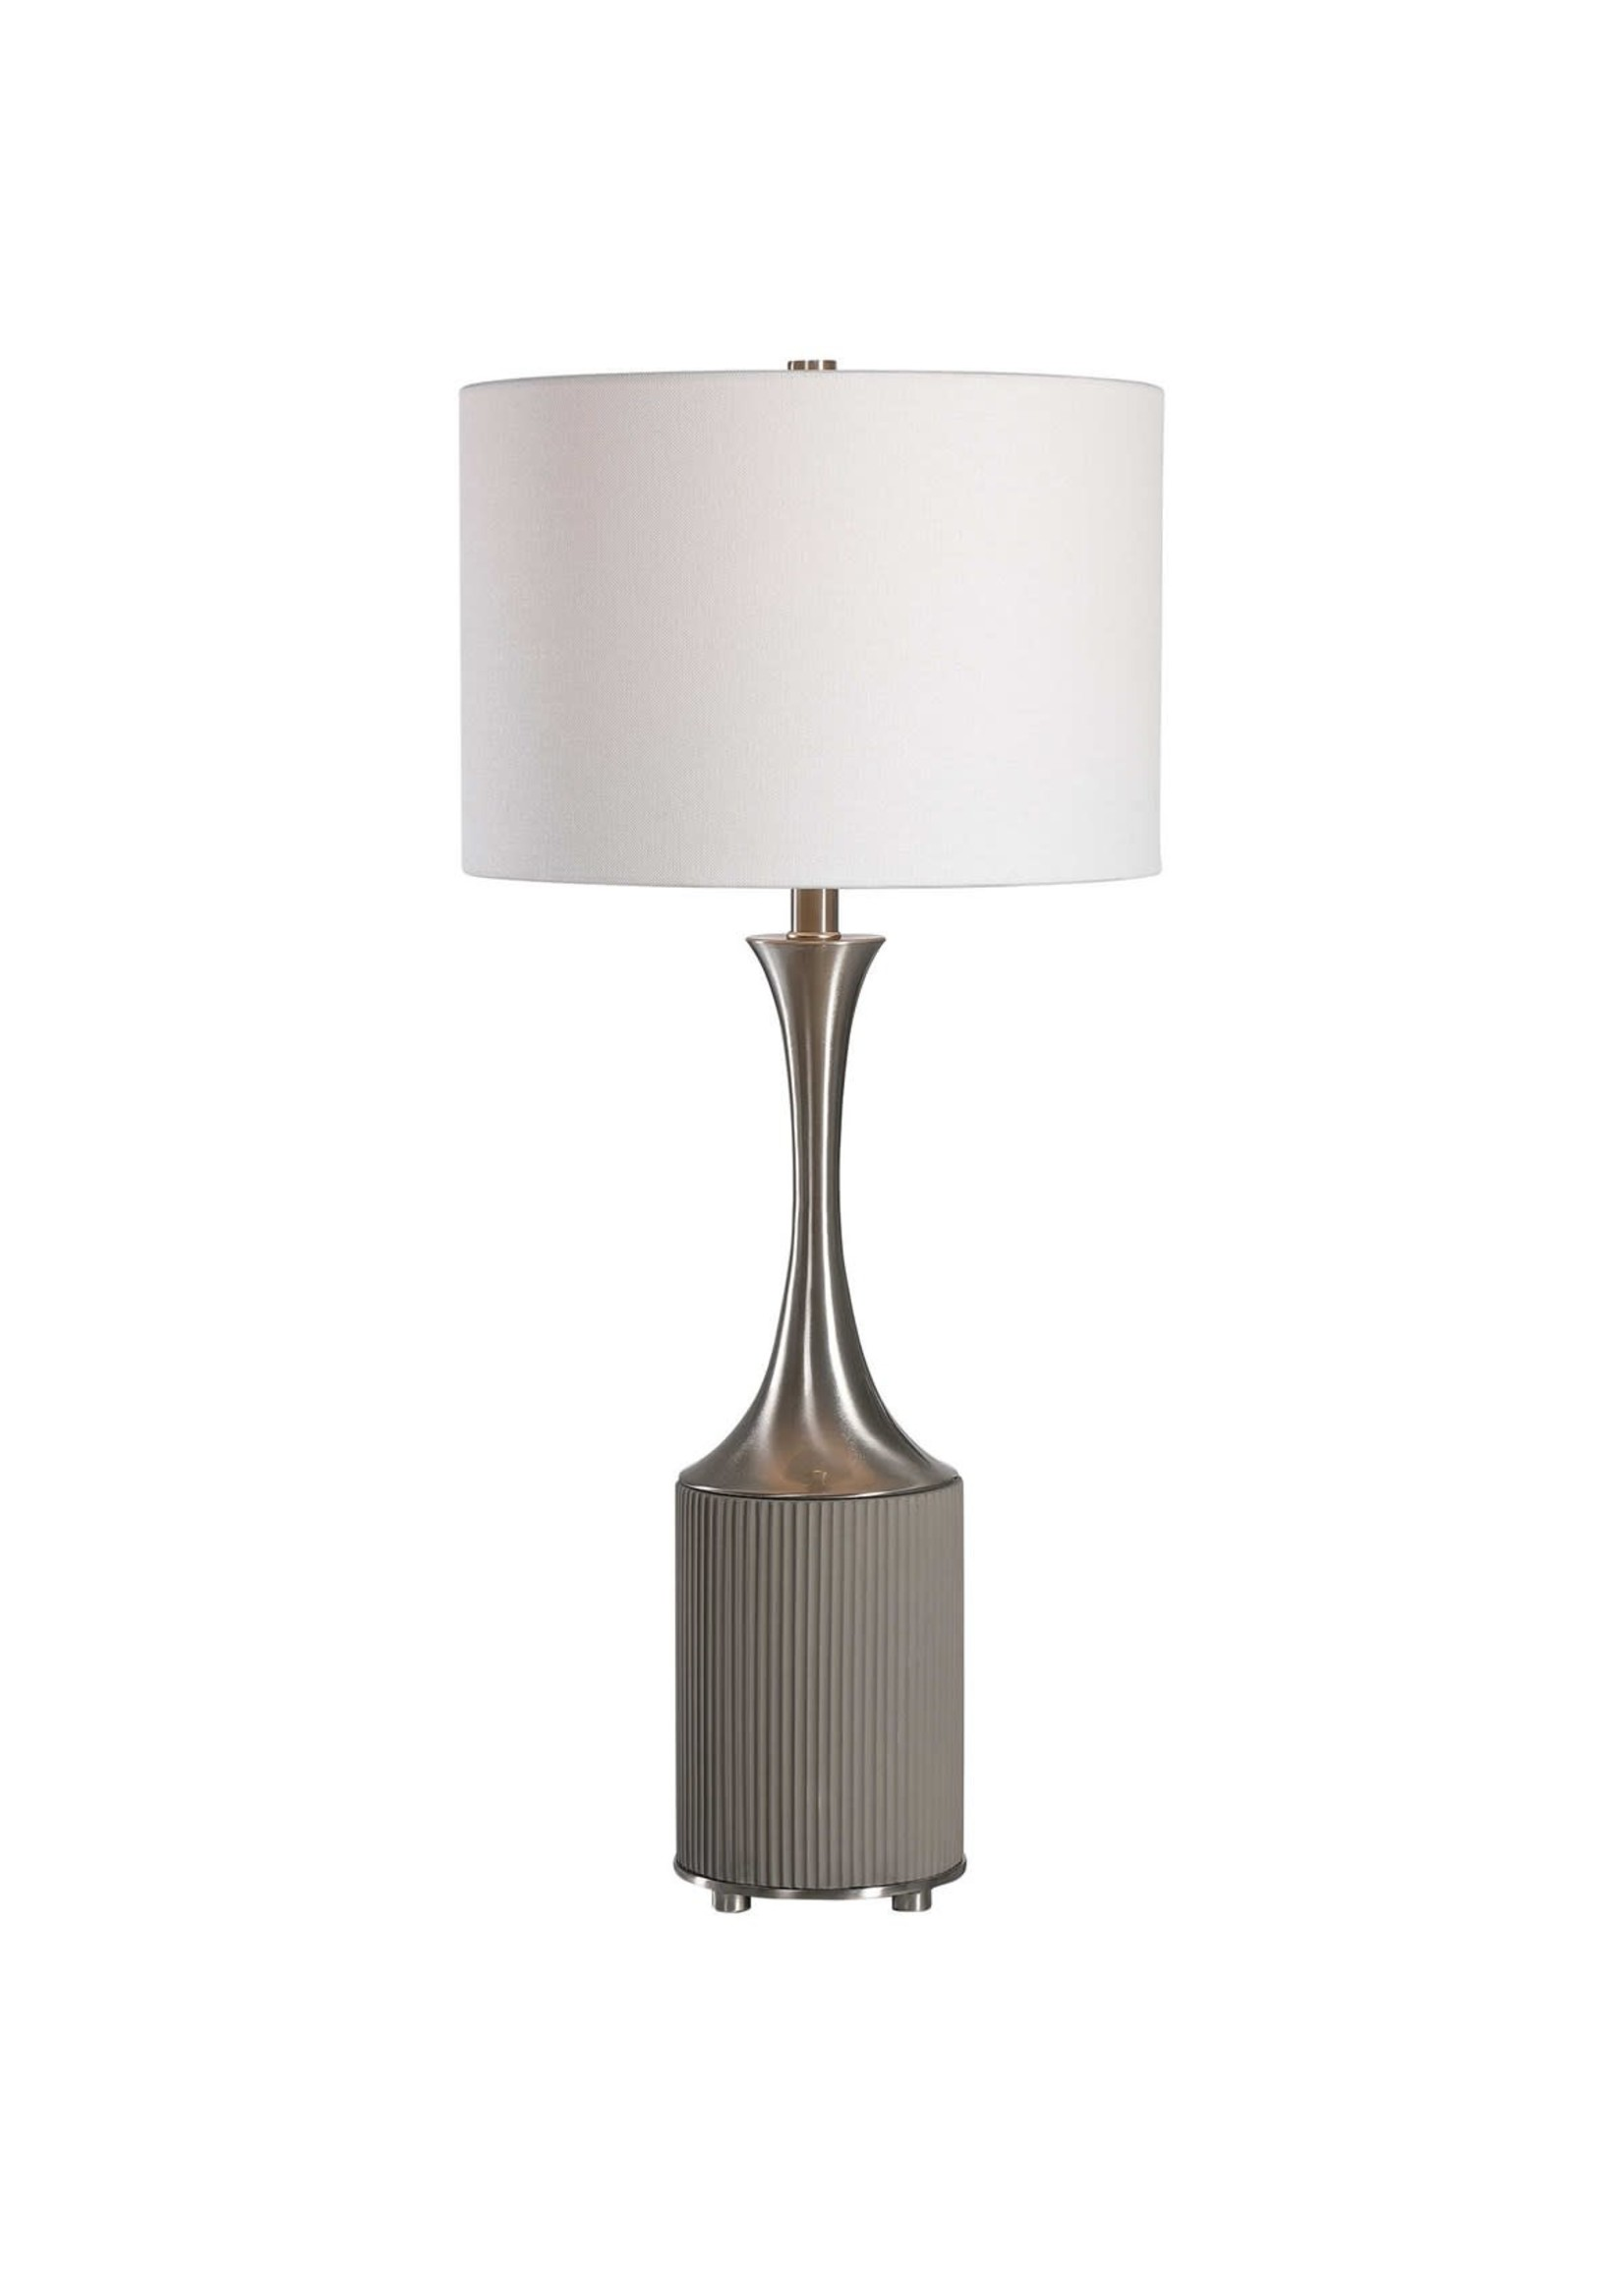 PITMAN TABLE LAMP